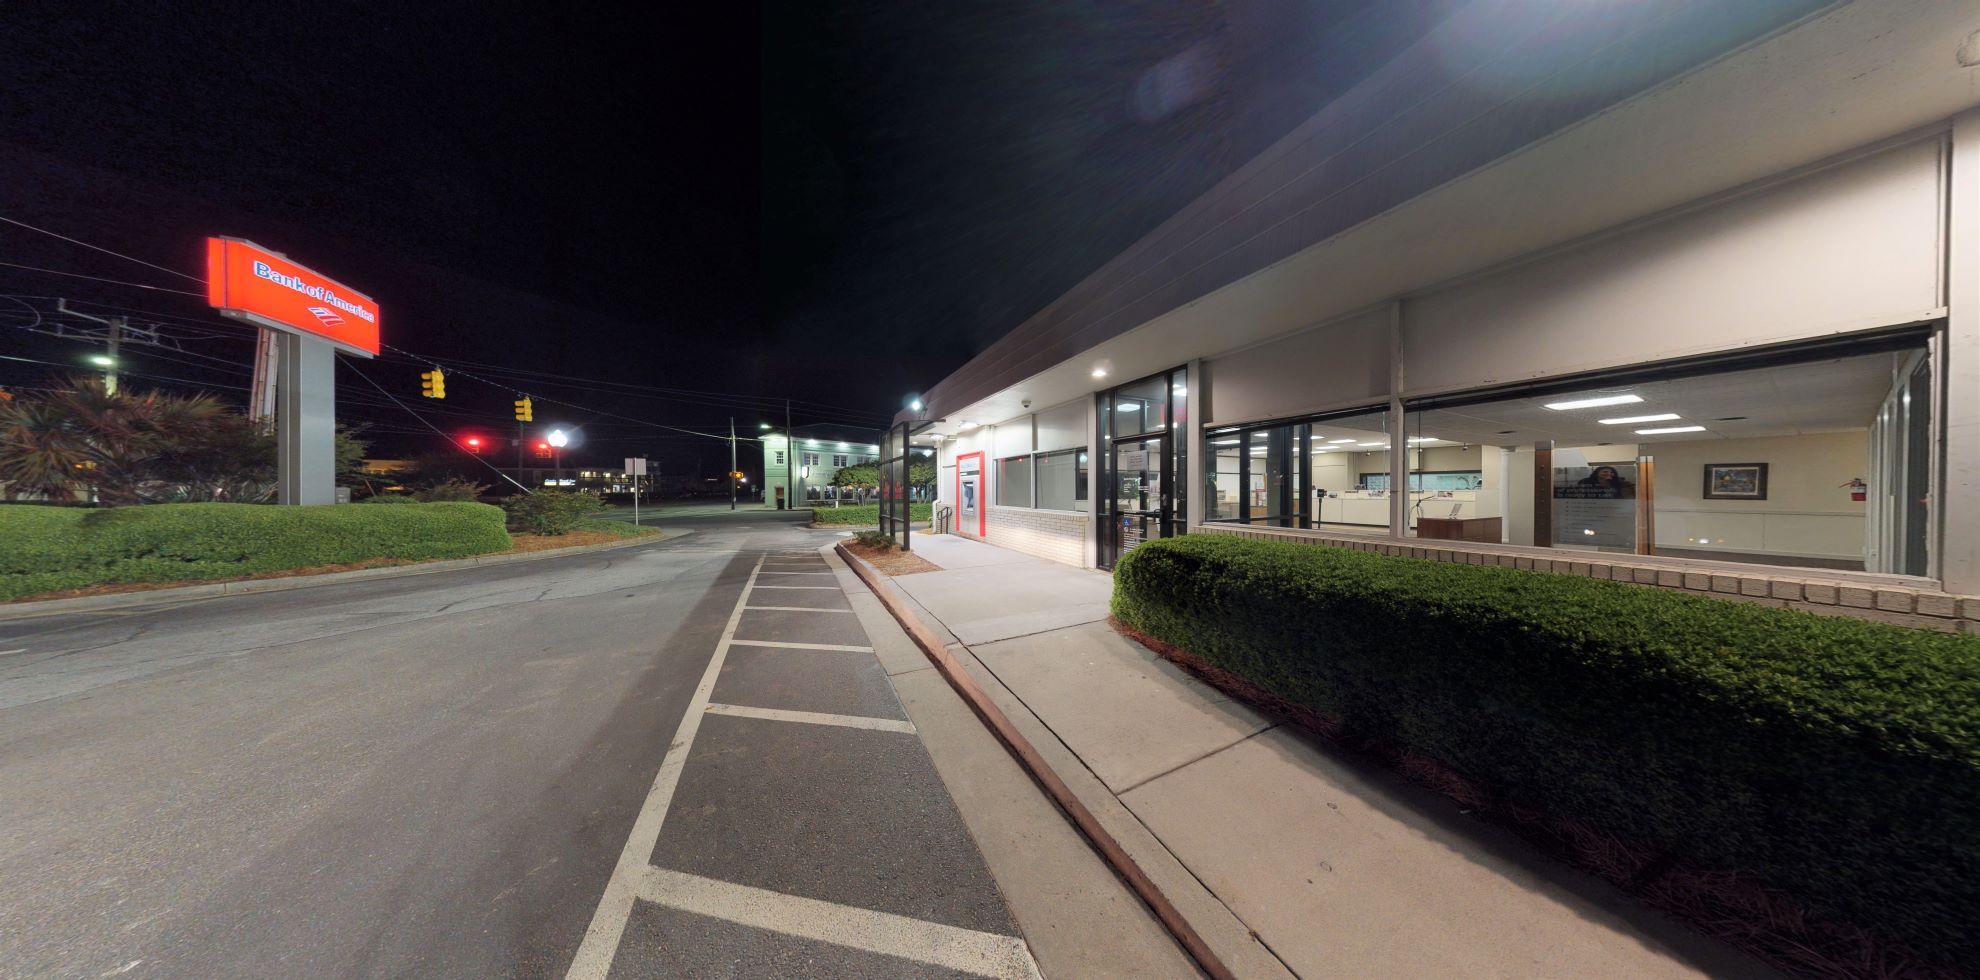 Bank of America financial center with walk-up ATM | 122 Harper Ave, Carolina Beach, NC 28428